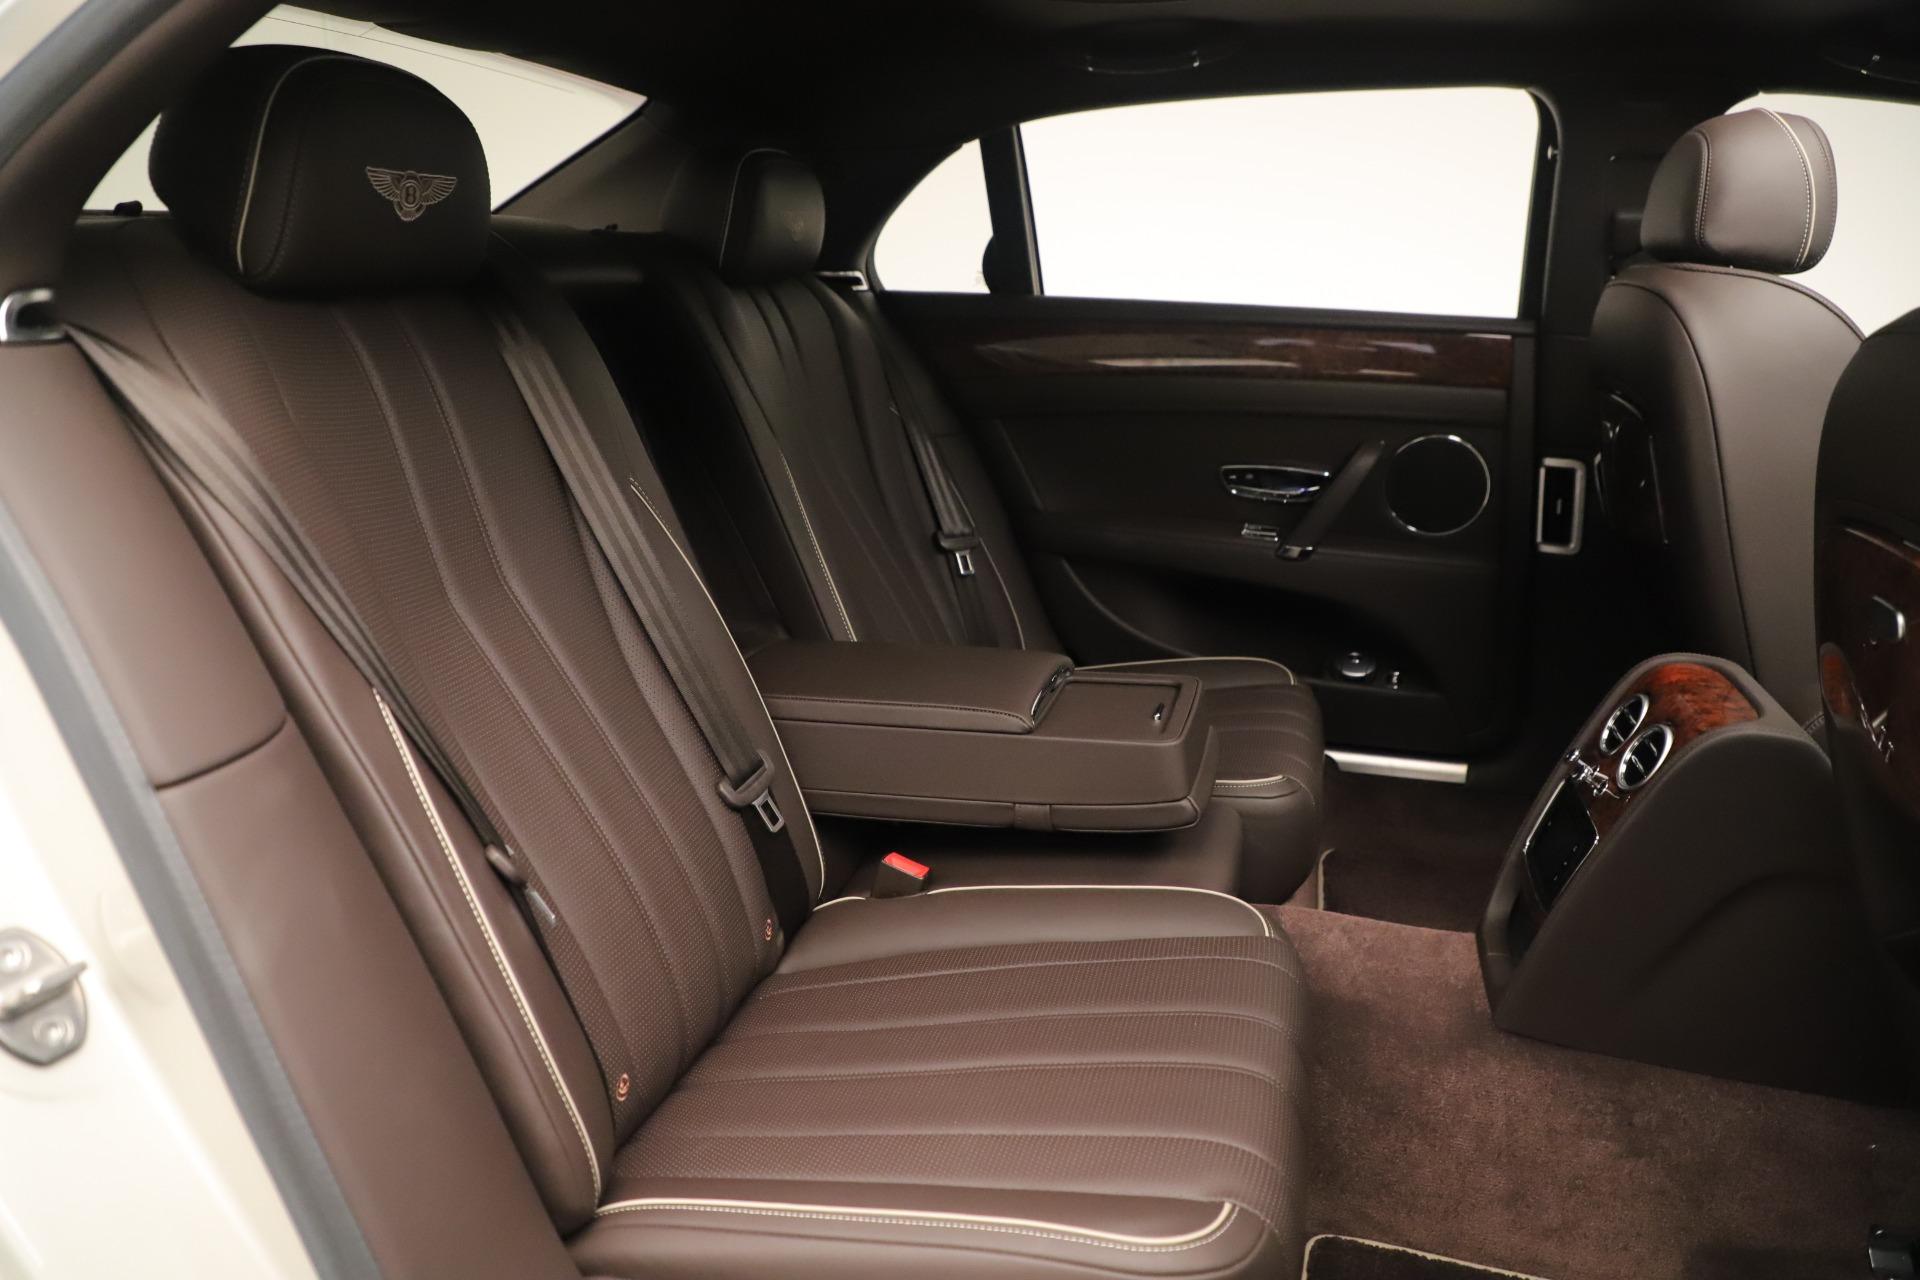 Used 2015 Bentley Flying Spur V8 For Sale In Westport, CT 3444_p30